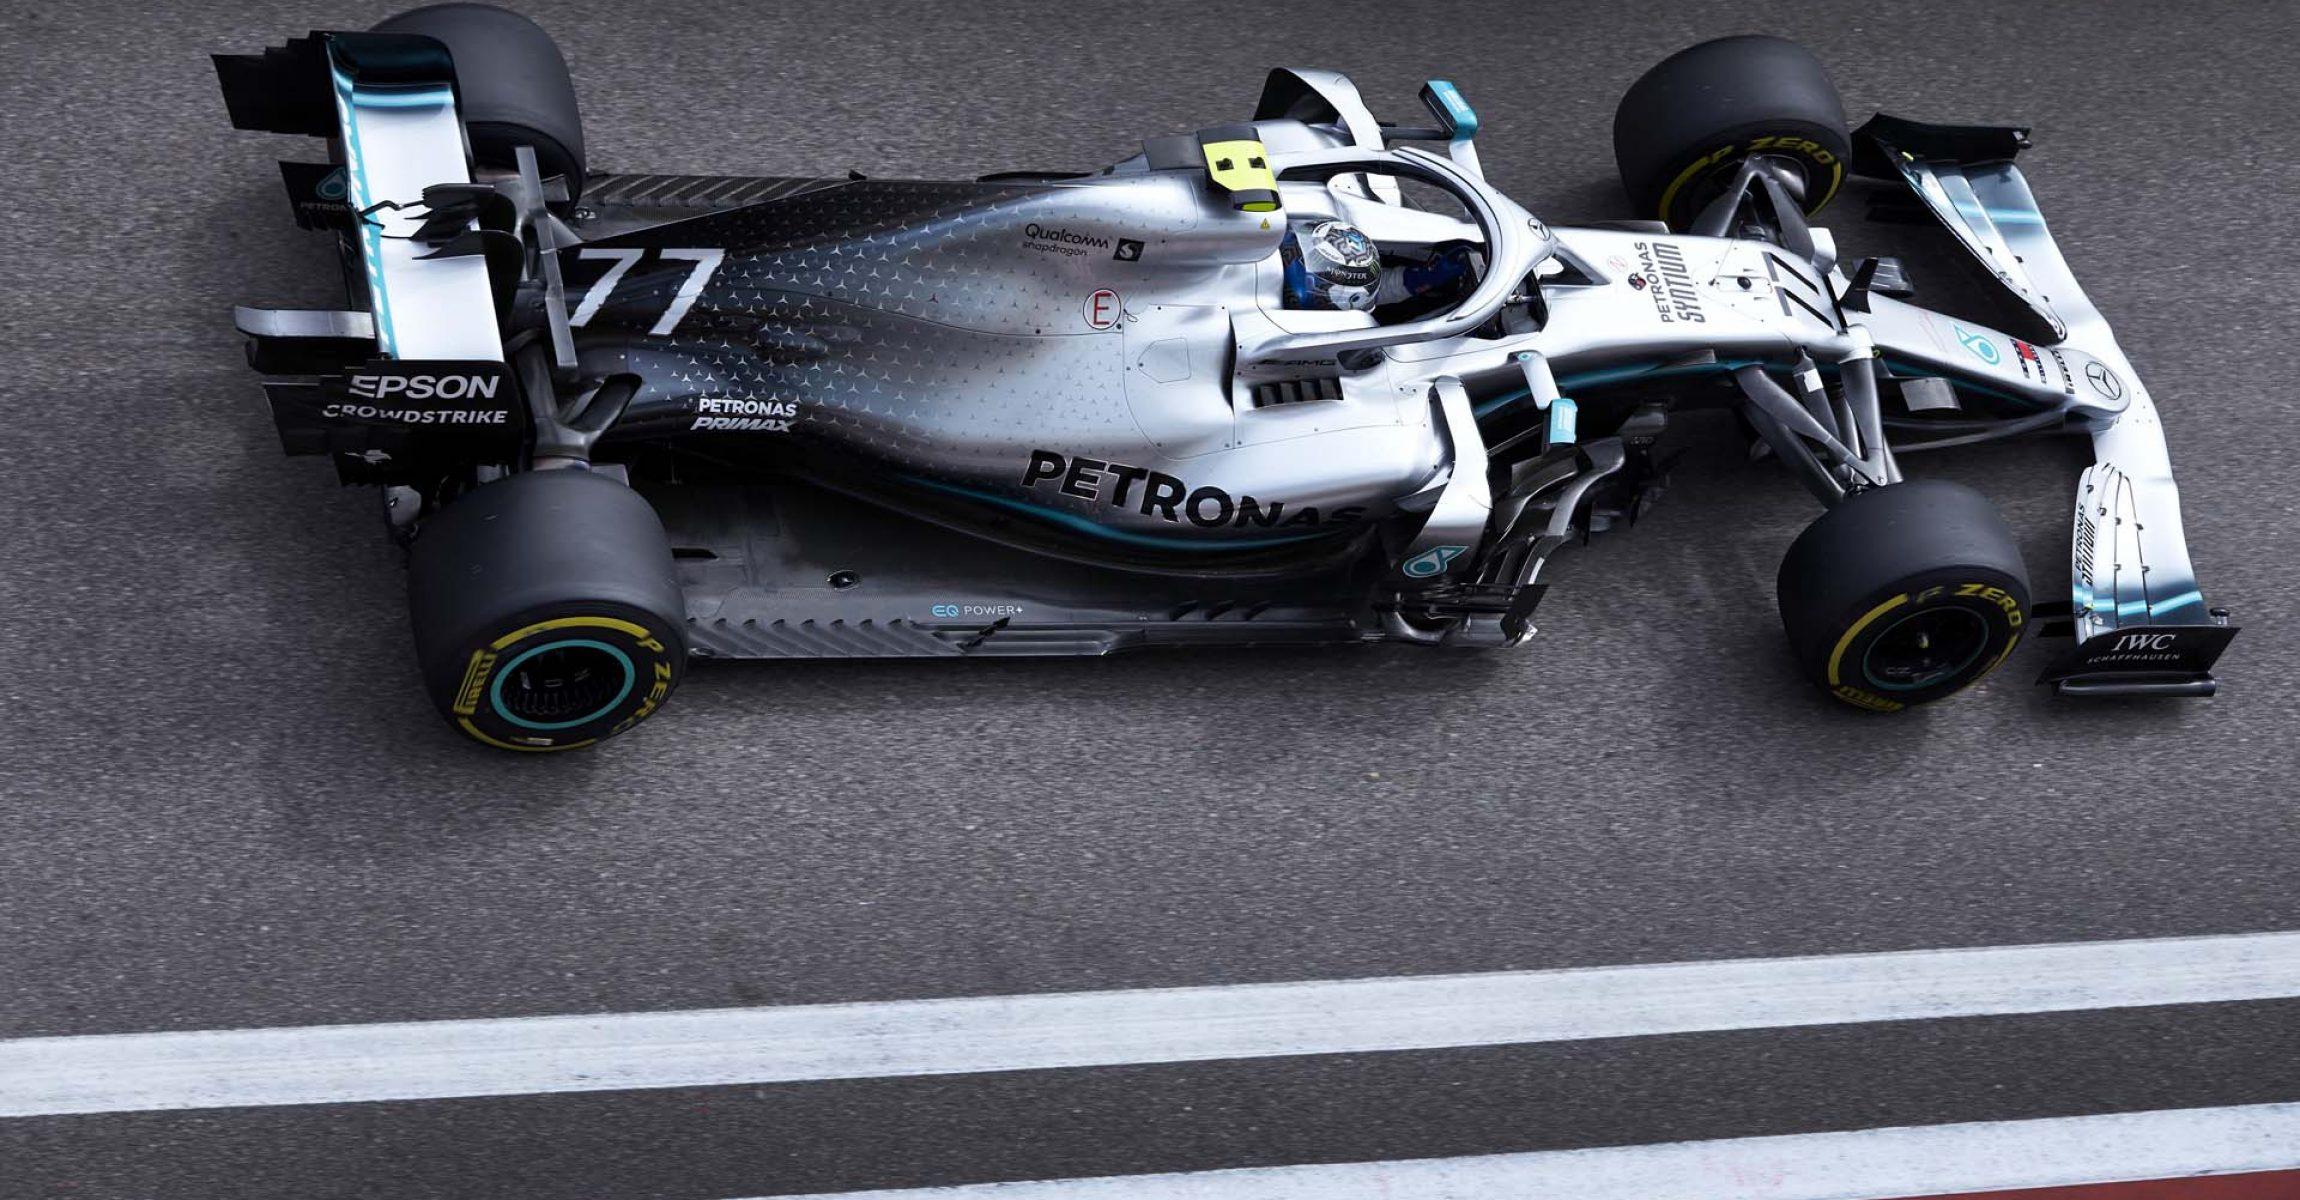 2019 Russian Grand Prix, Friday - Steve Etherington Valtteri Bottas Mercedes